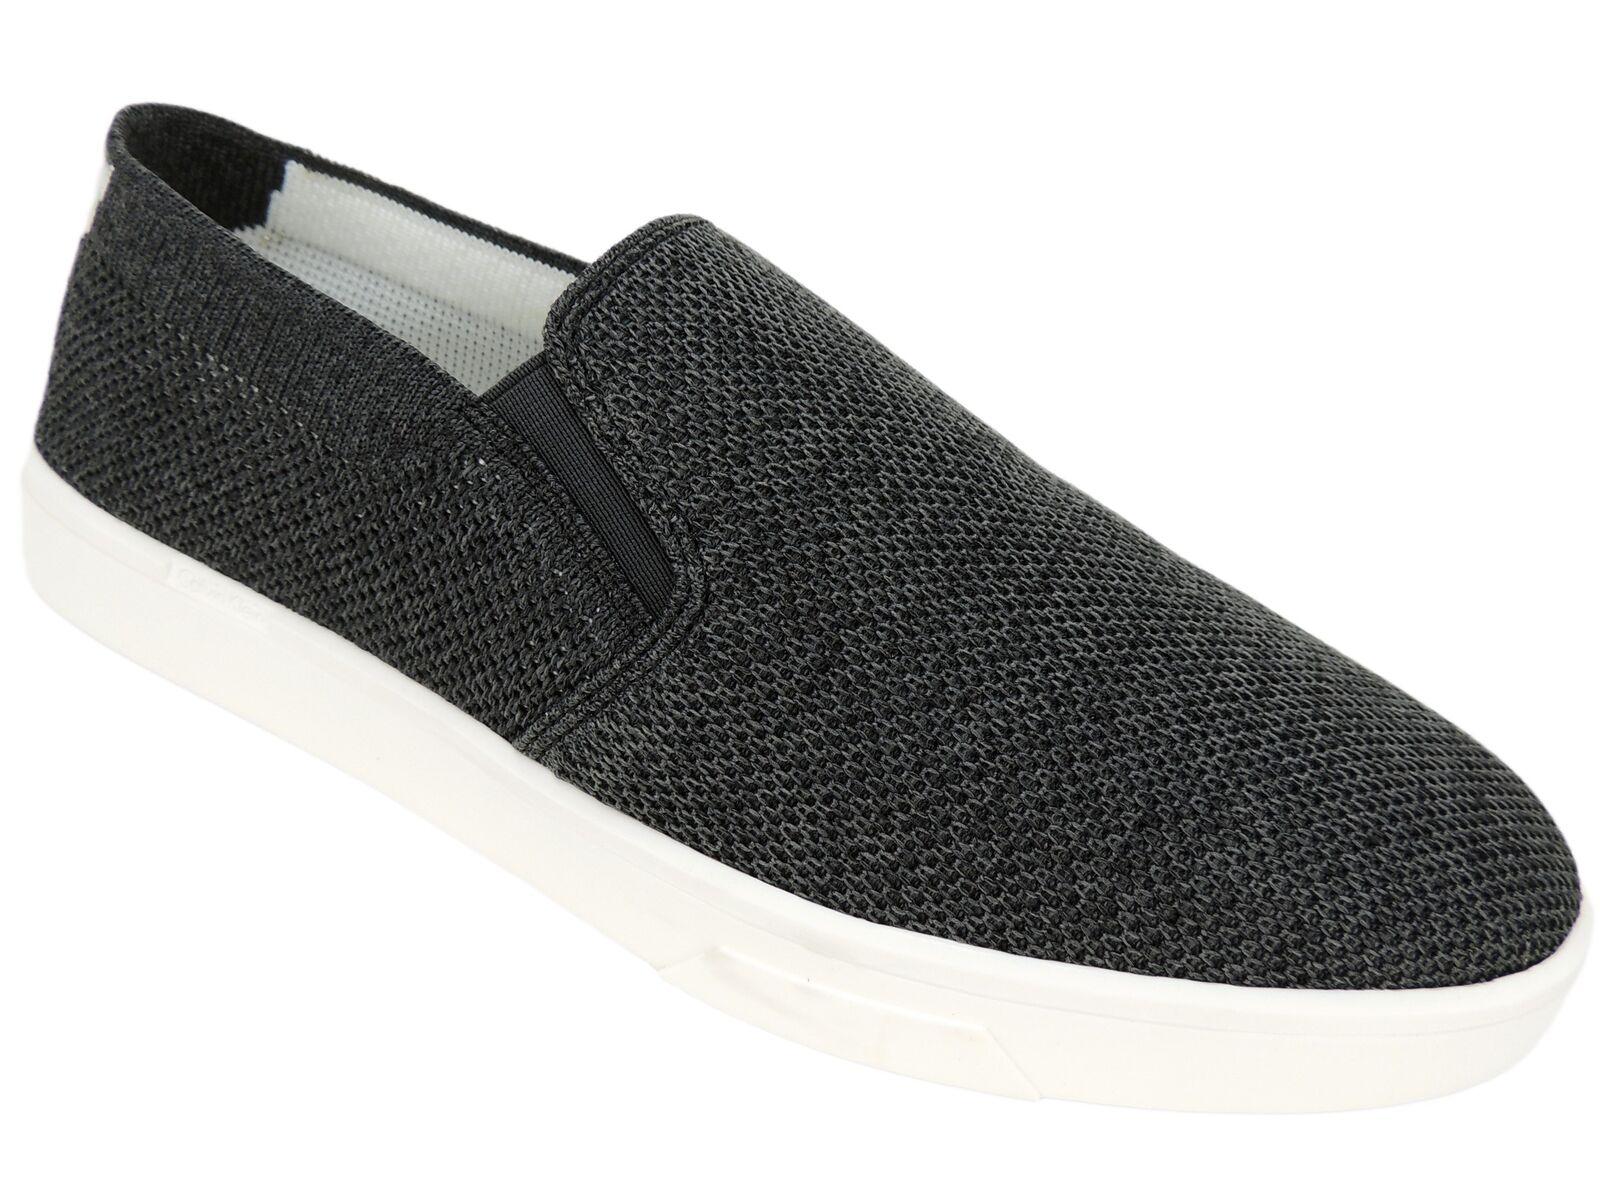 Calvin Klein Women's Inca Slip On Sneakers Black Stretchy Knit Size 8.5 M